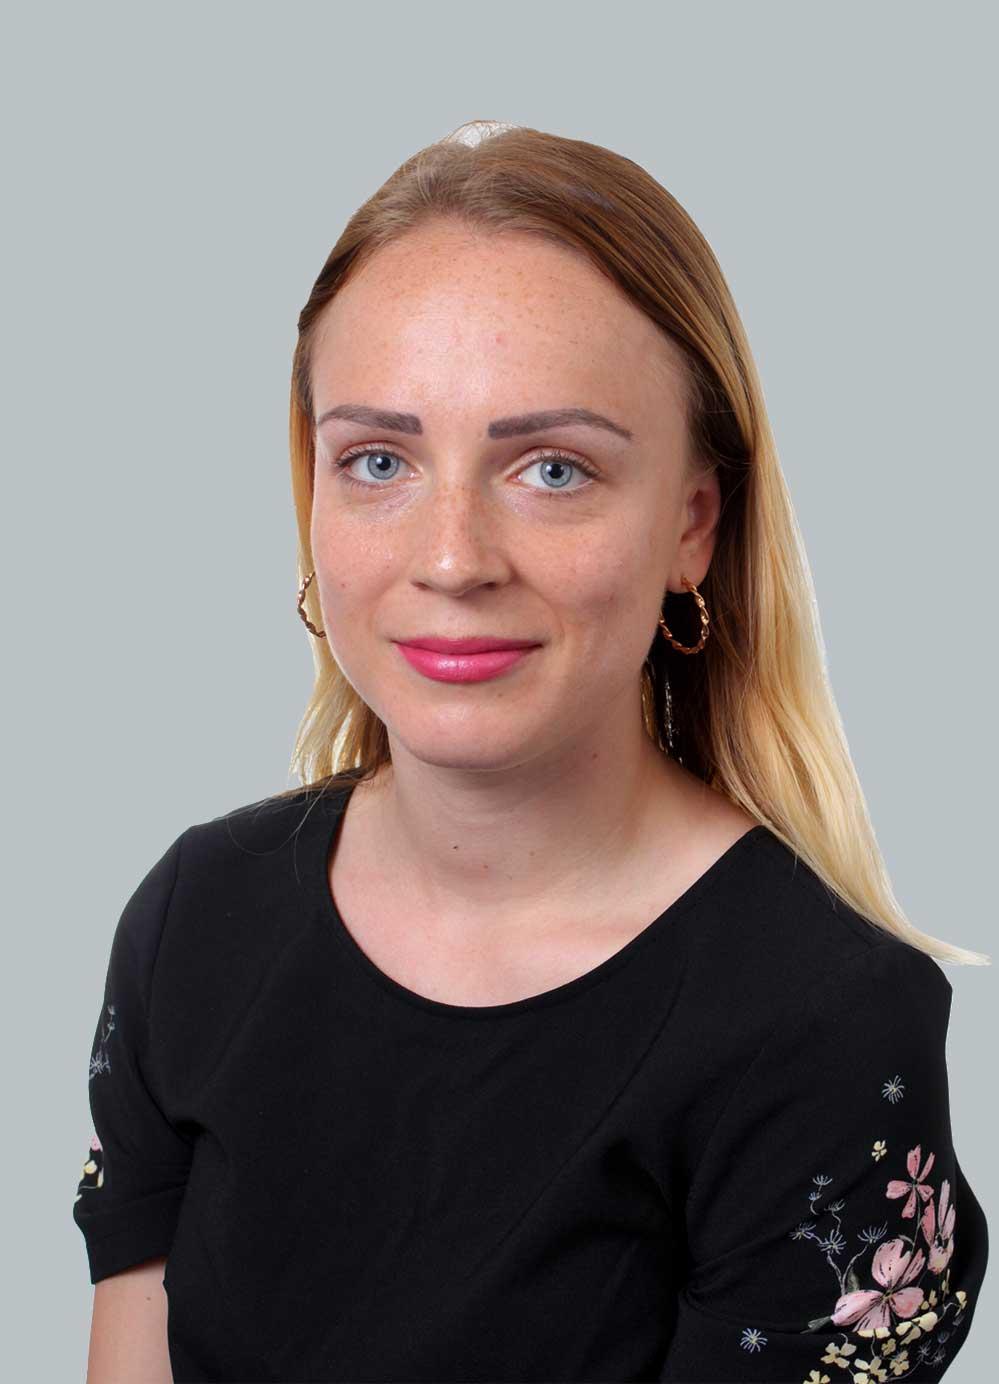 Aneta Pribylova